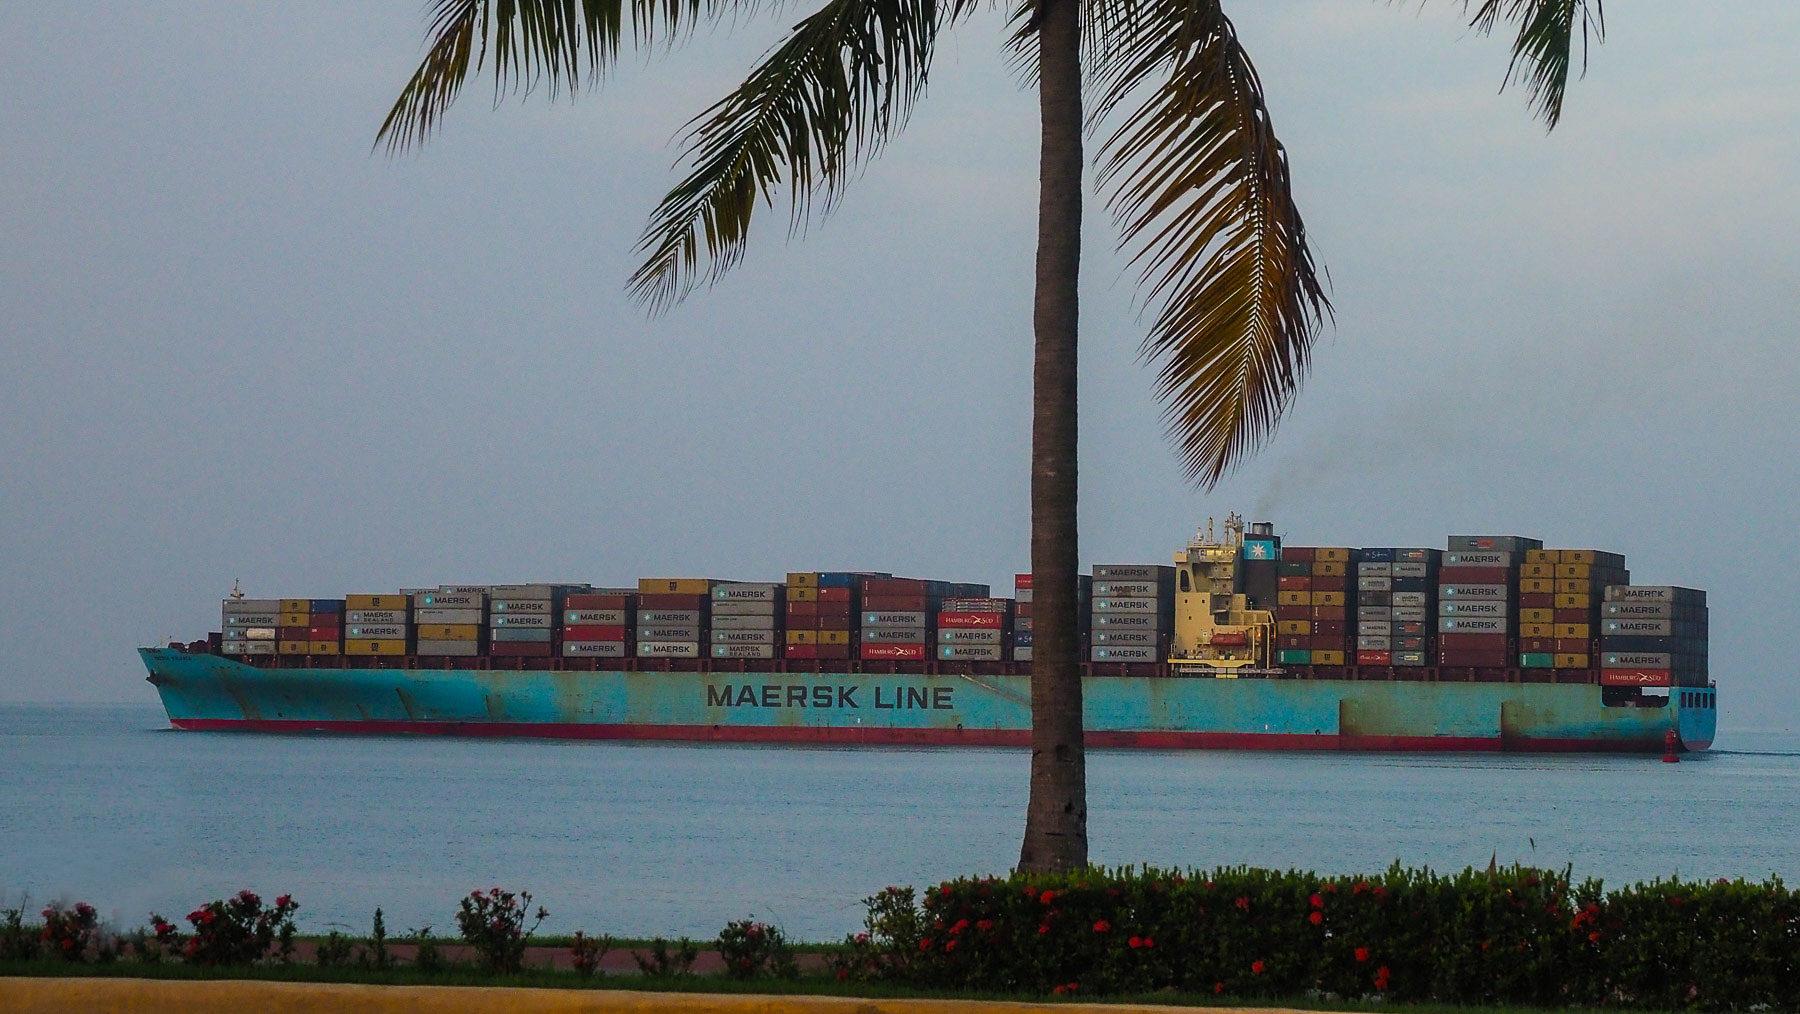 Panamakanal – riesige Frachtschiffe ziehen vorbei